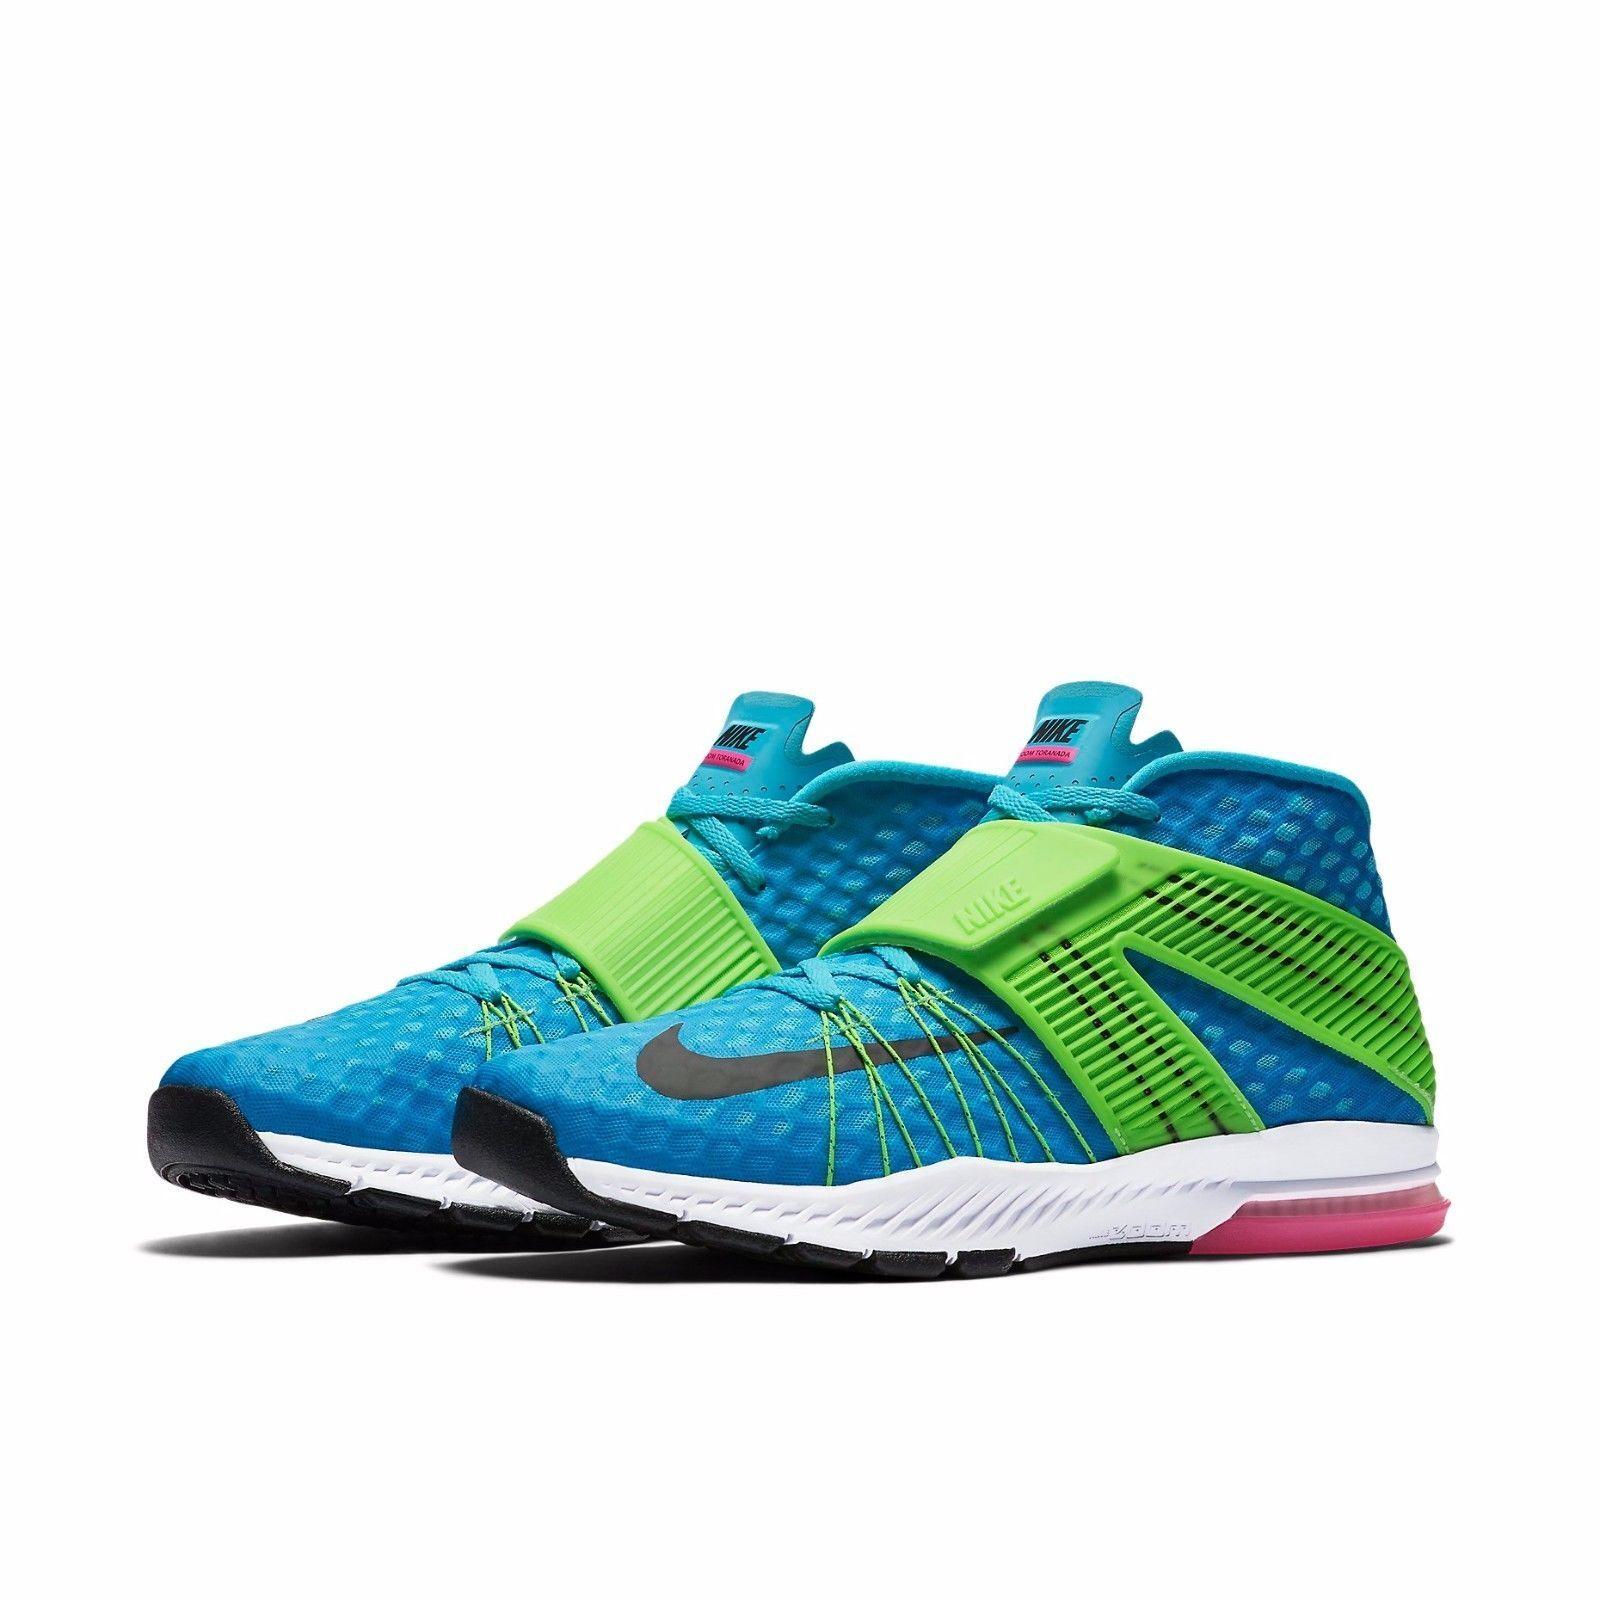 Para hombres Nike 835657403 Zoom tren toranada Azul/Verde/Rosa/Blanco 835657403 Nike Super Fit e74485